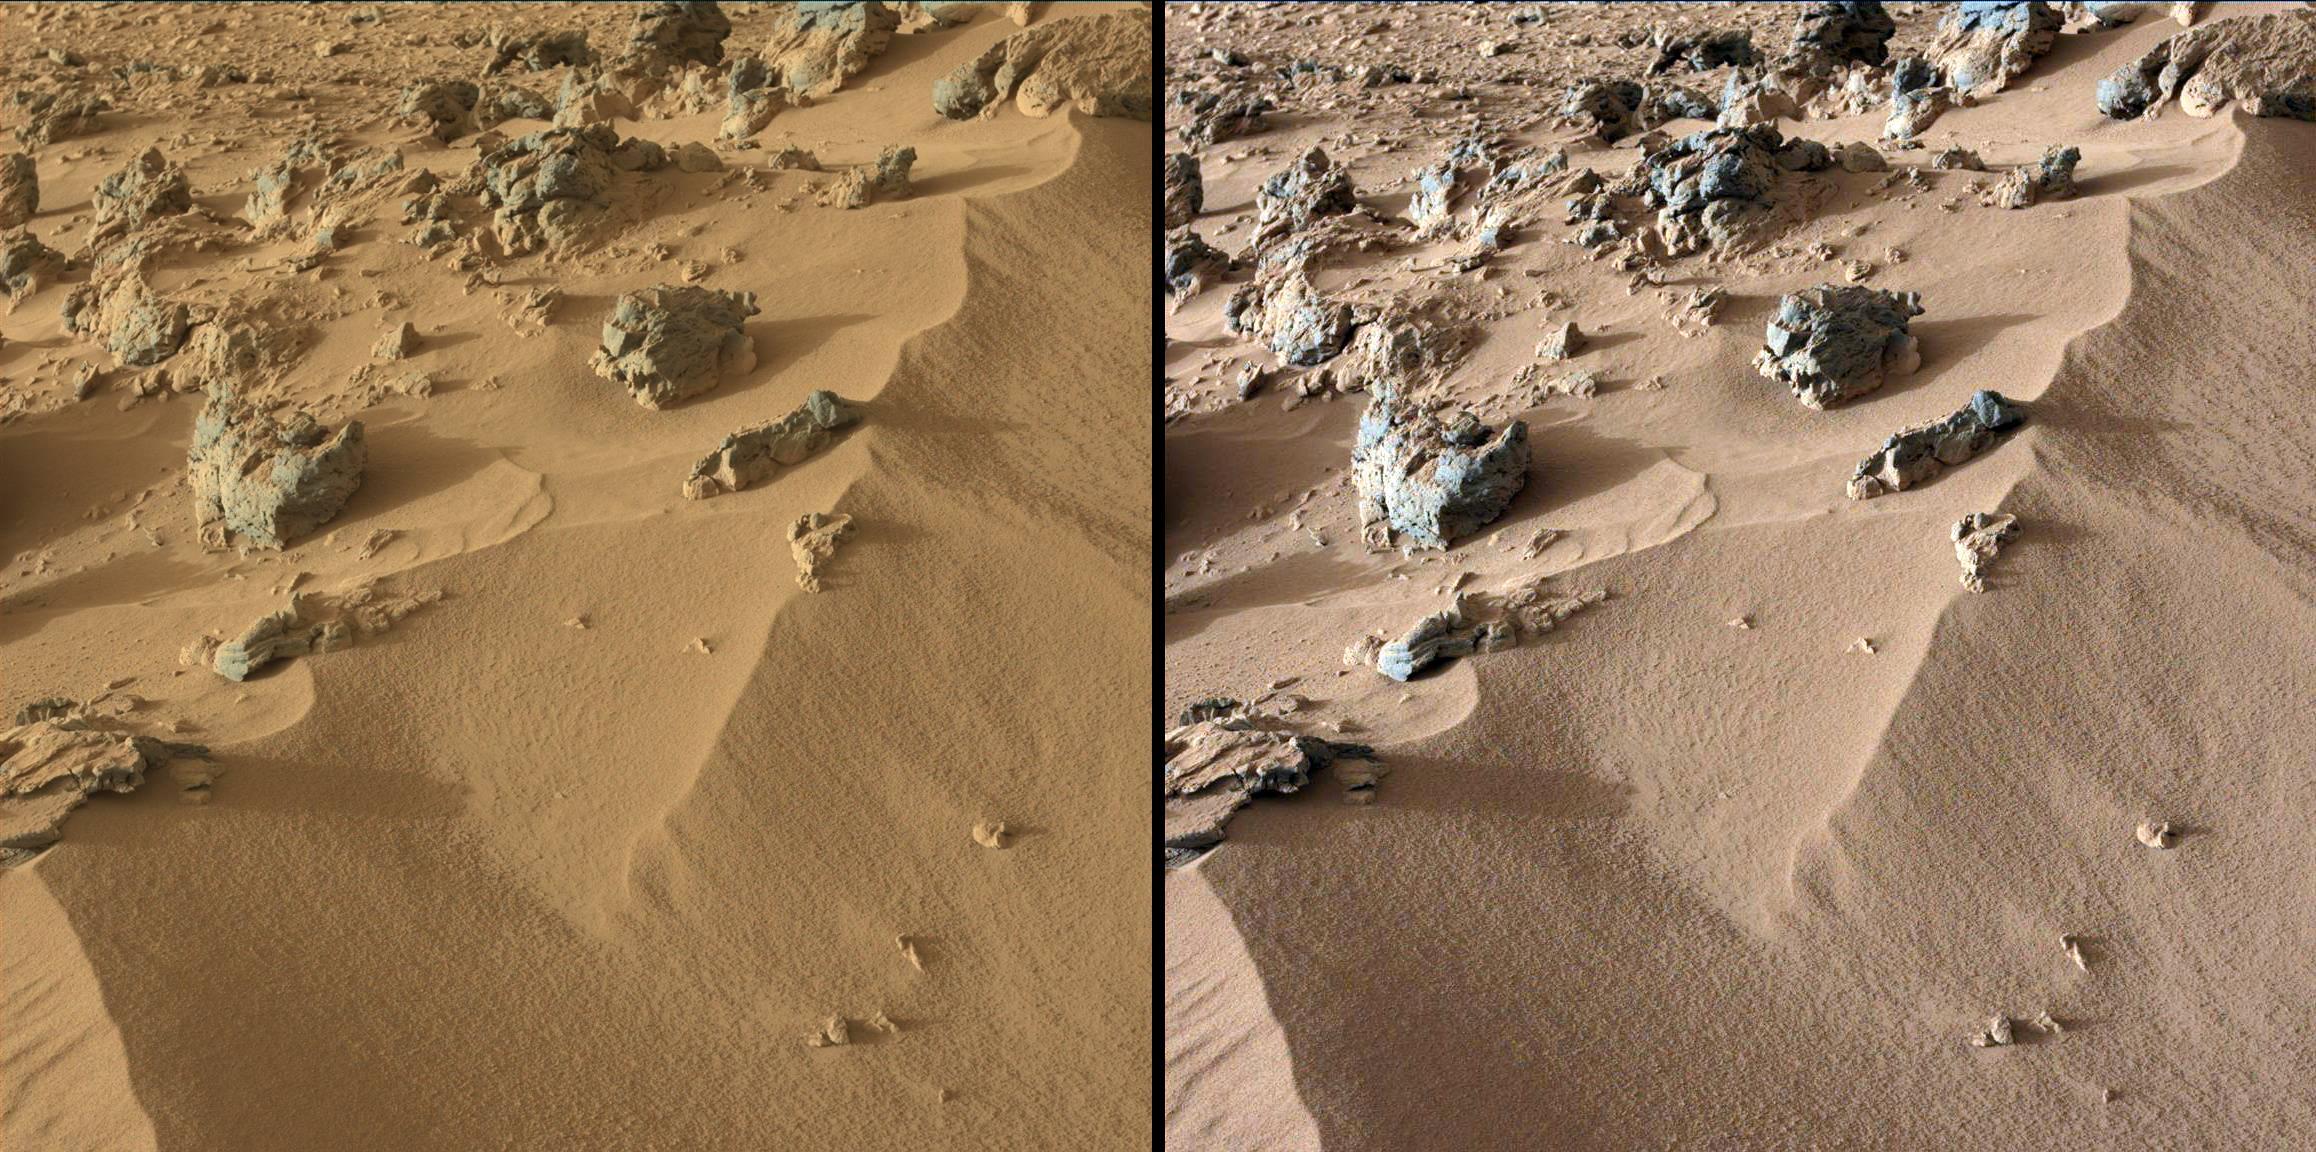 Curiosity Photos of 'Rocknest' Site